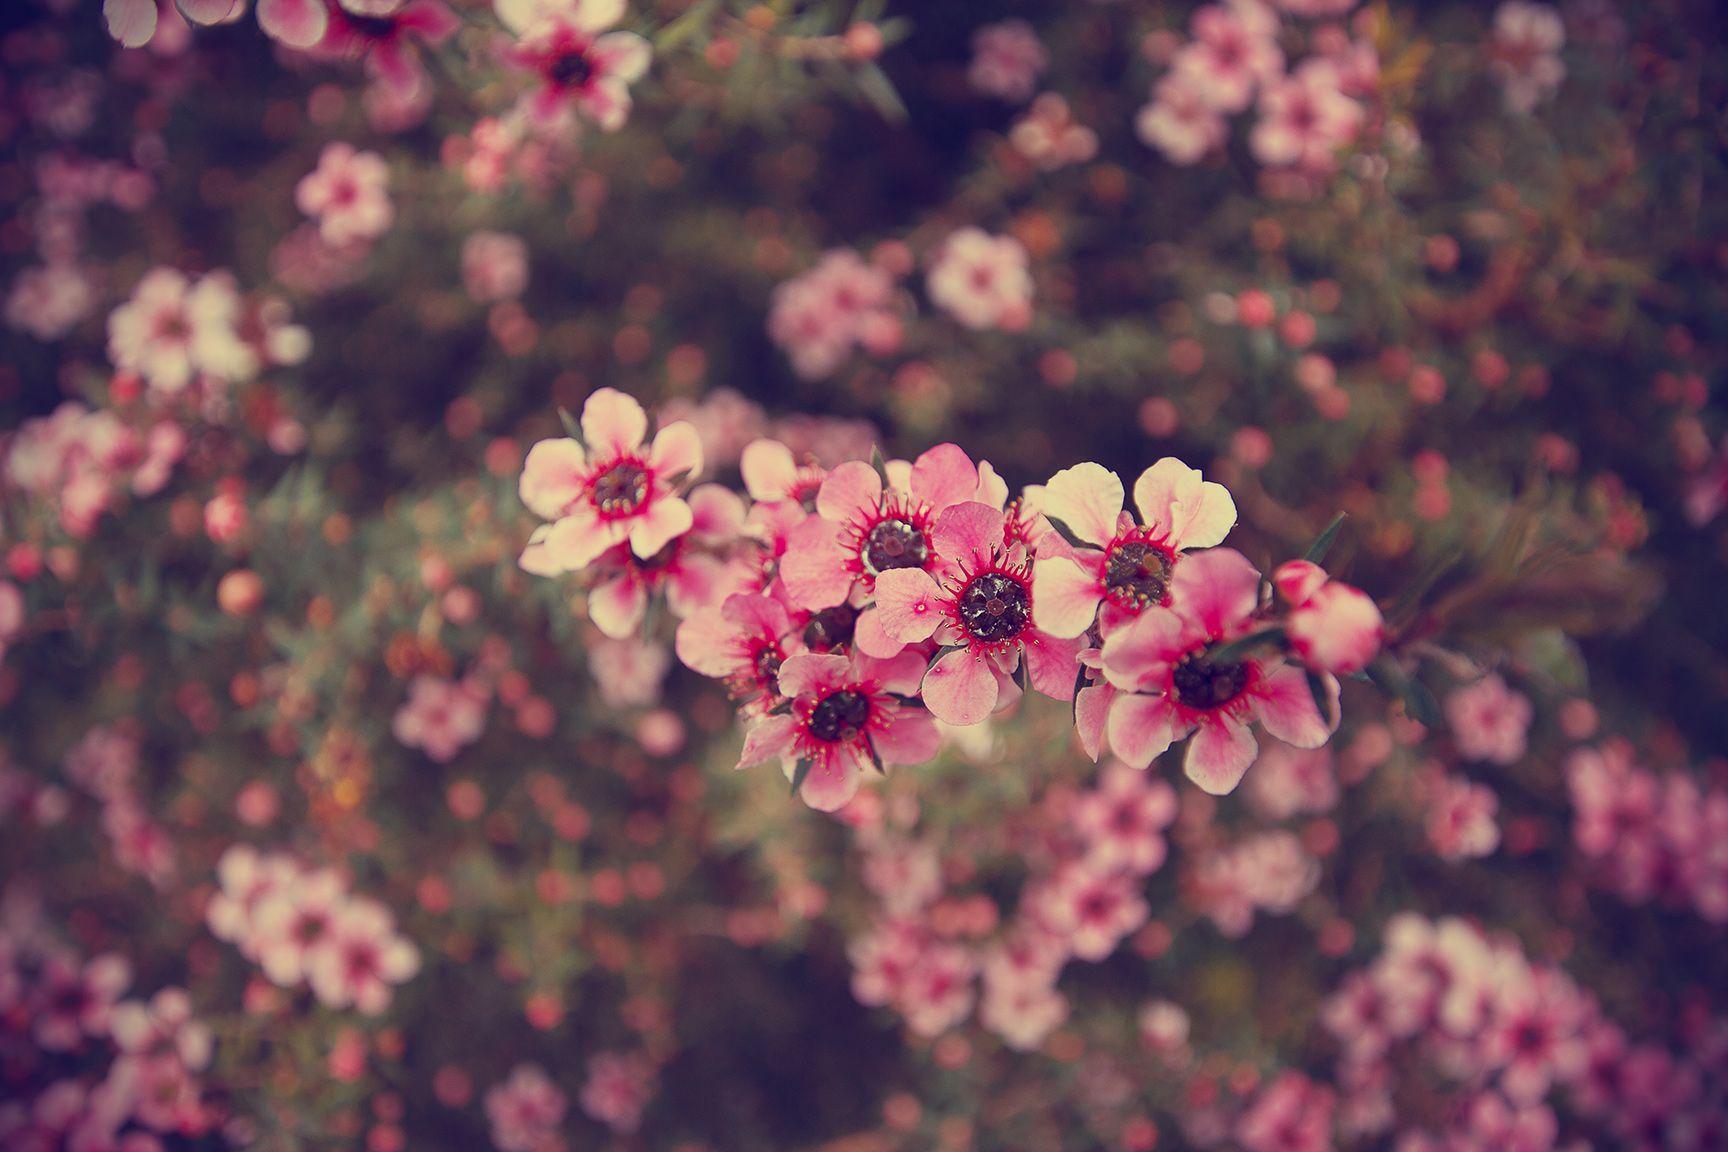 Backgrounds Tumblr Flower Vintage Wallpaper Cave